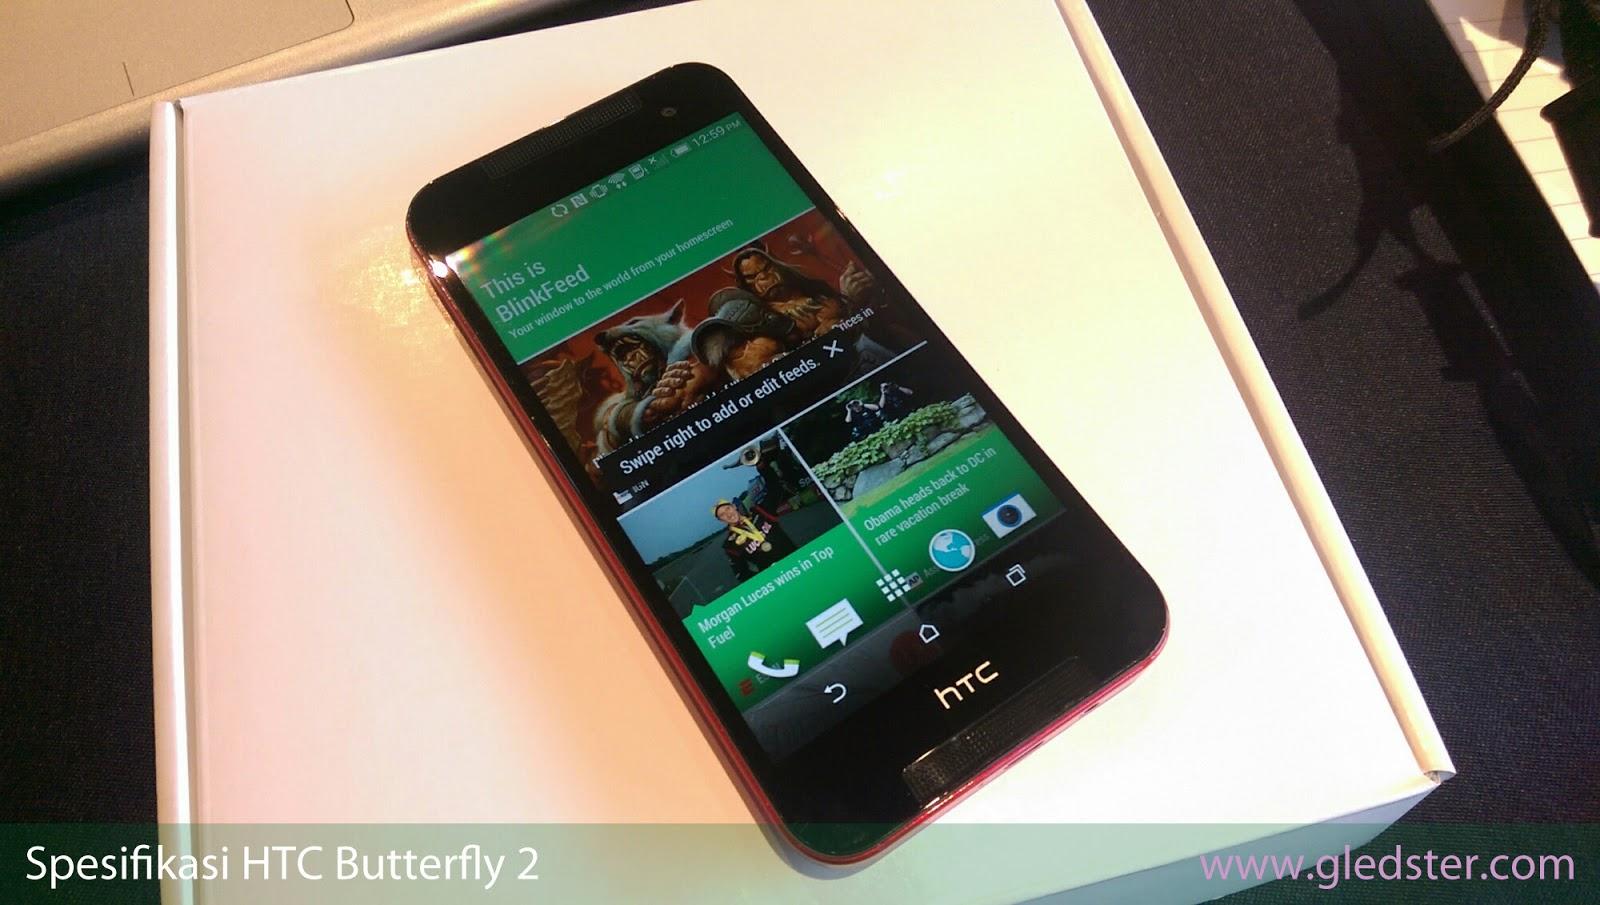 Spesifikasi HTC Butterfly 2